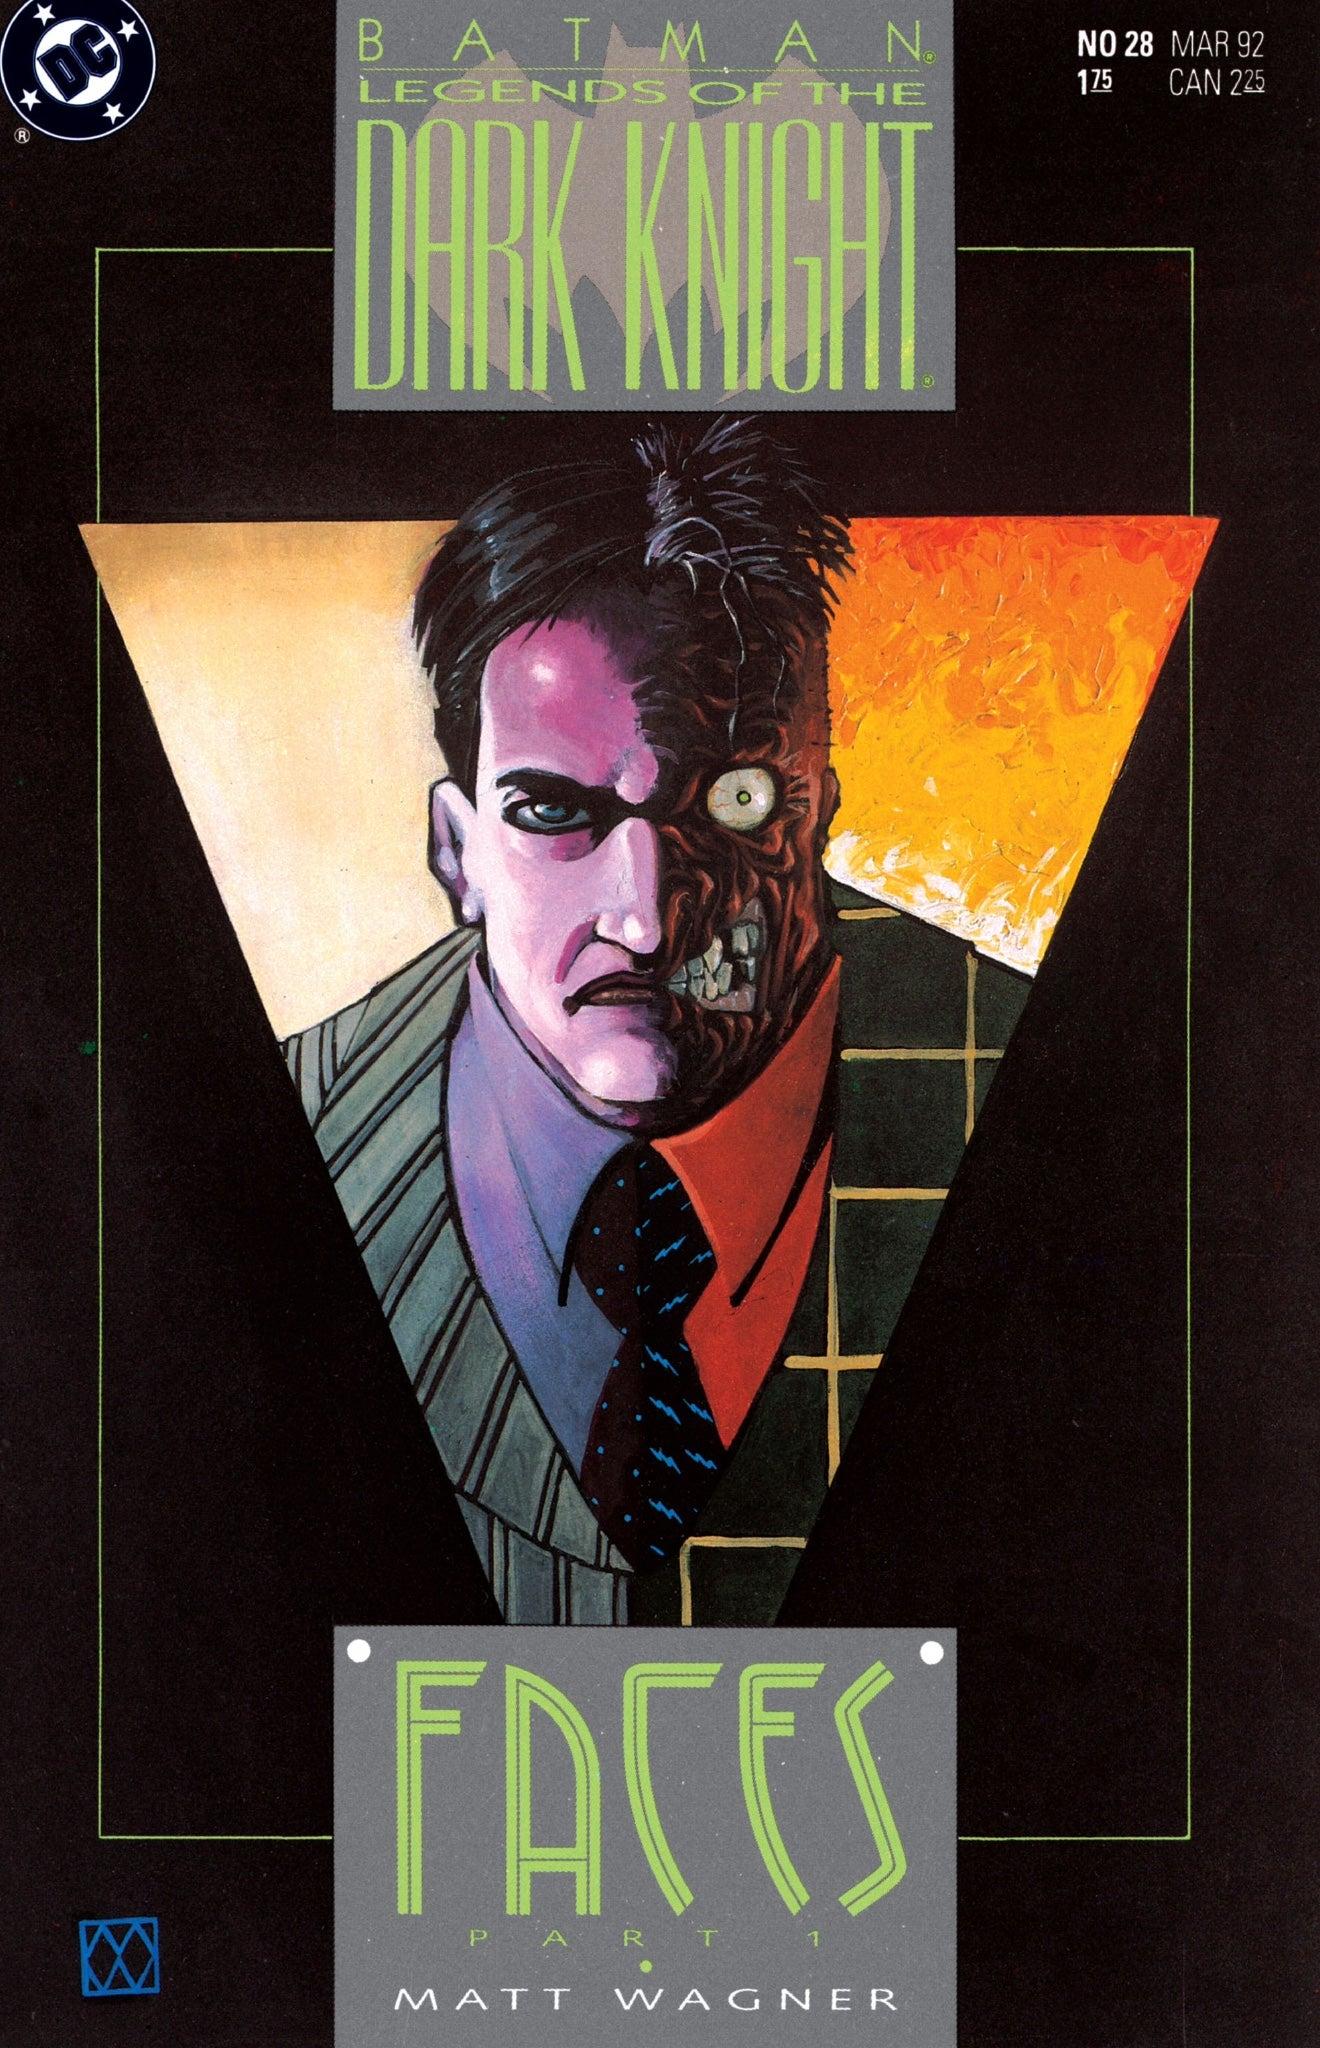 Legends of Dark Knight 28 cover